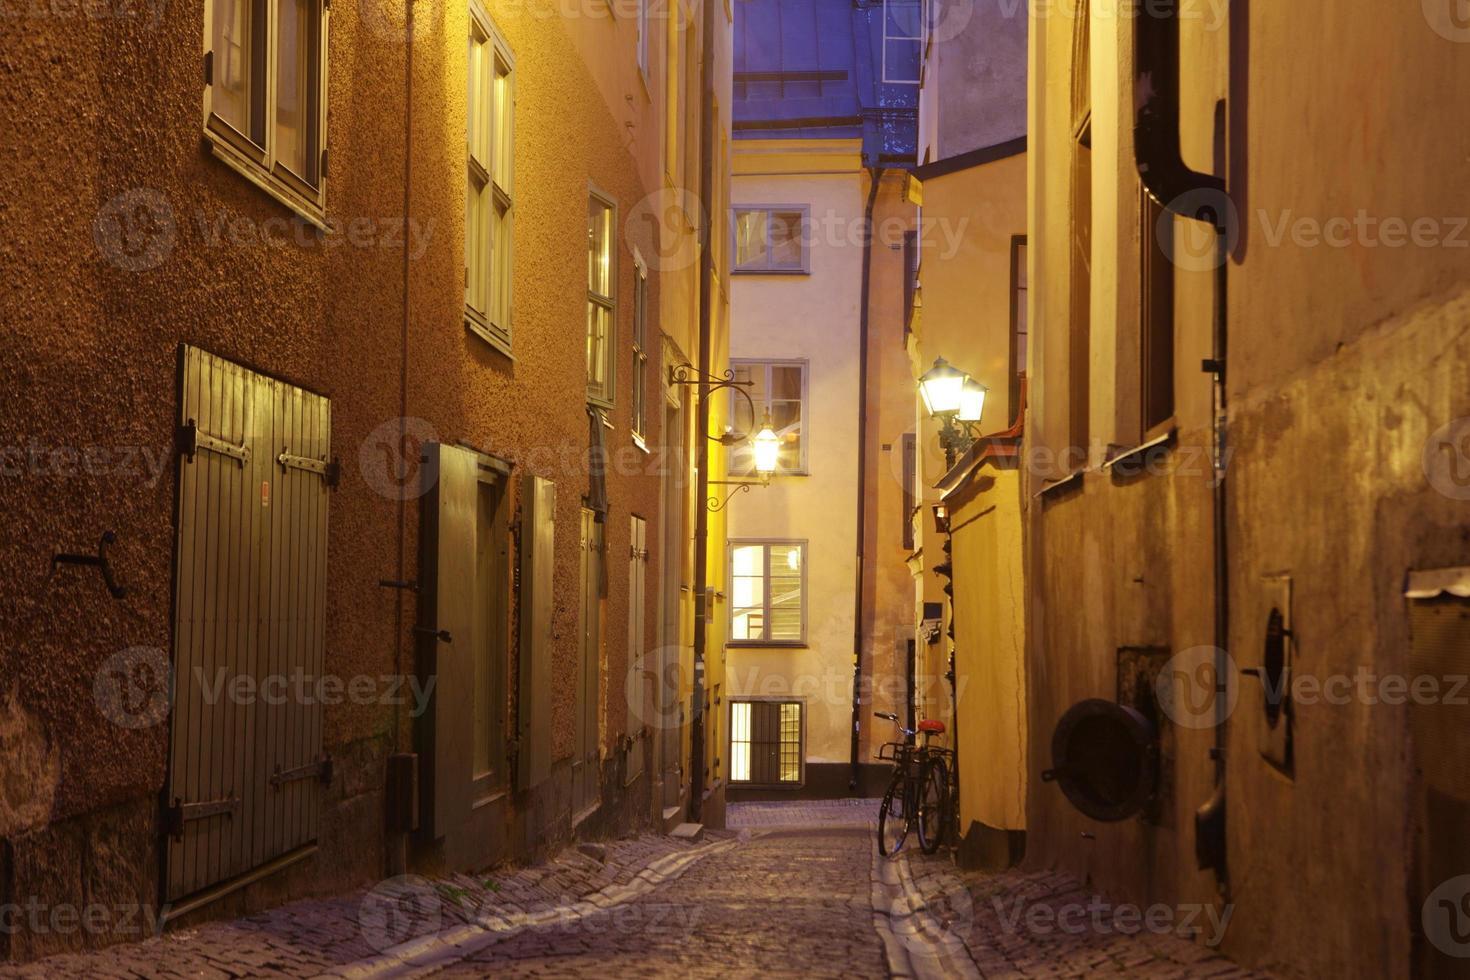 gamla stans smala gata - historiska staden Stockholm, foto